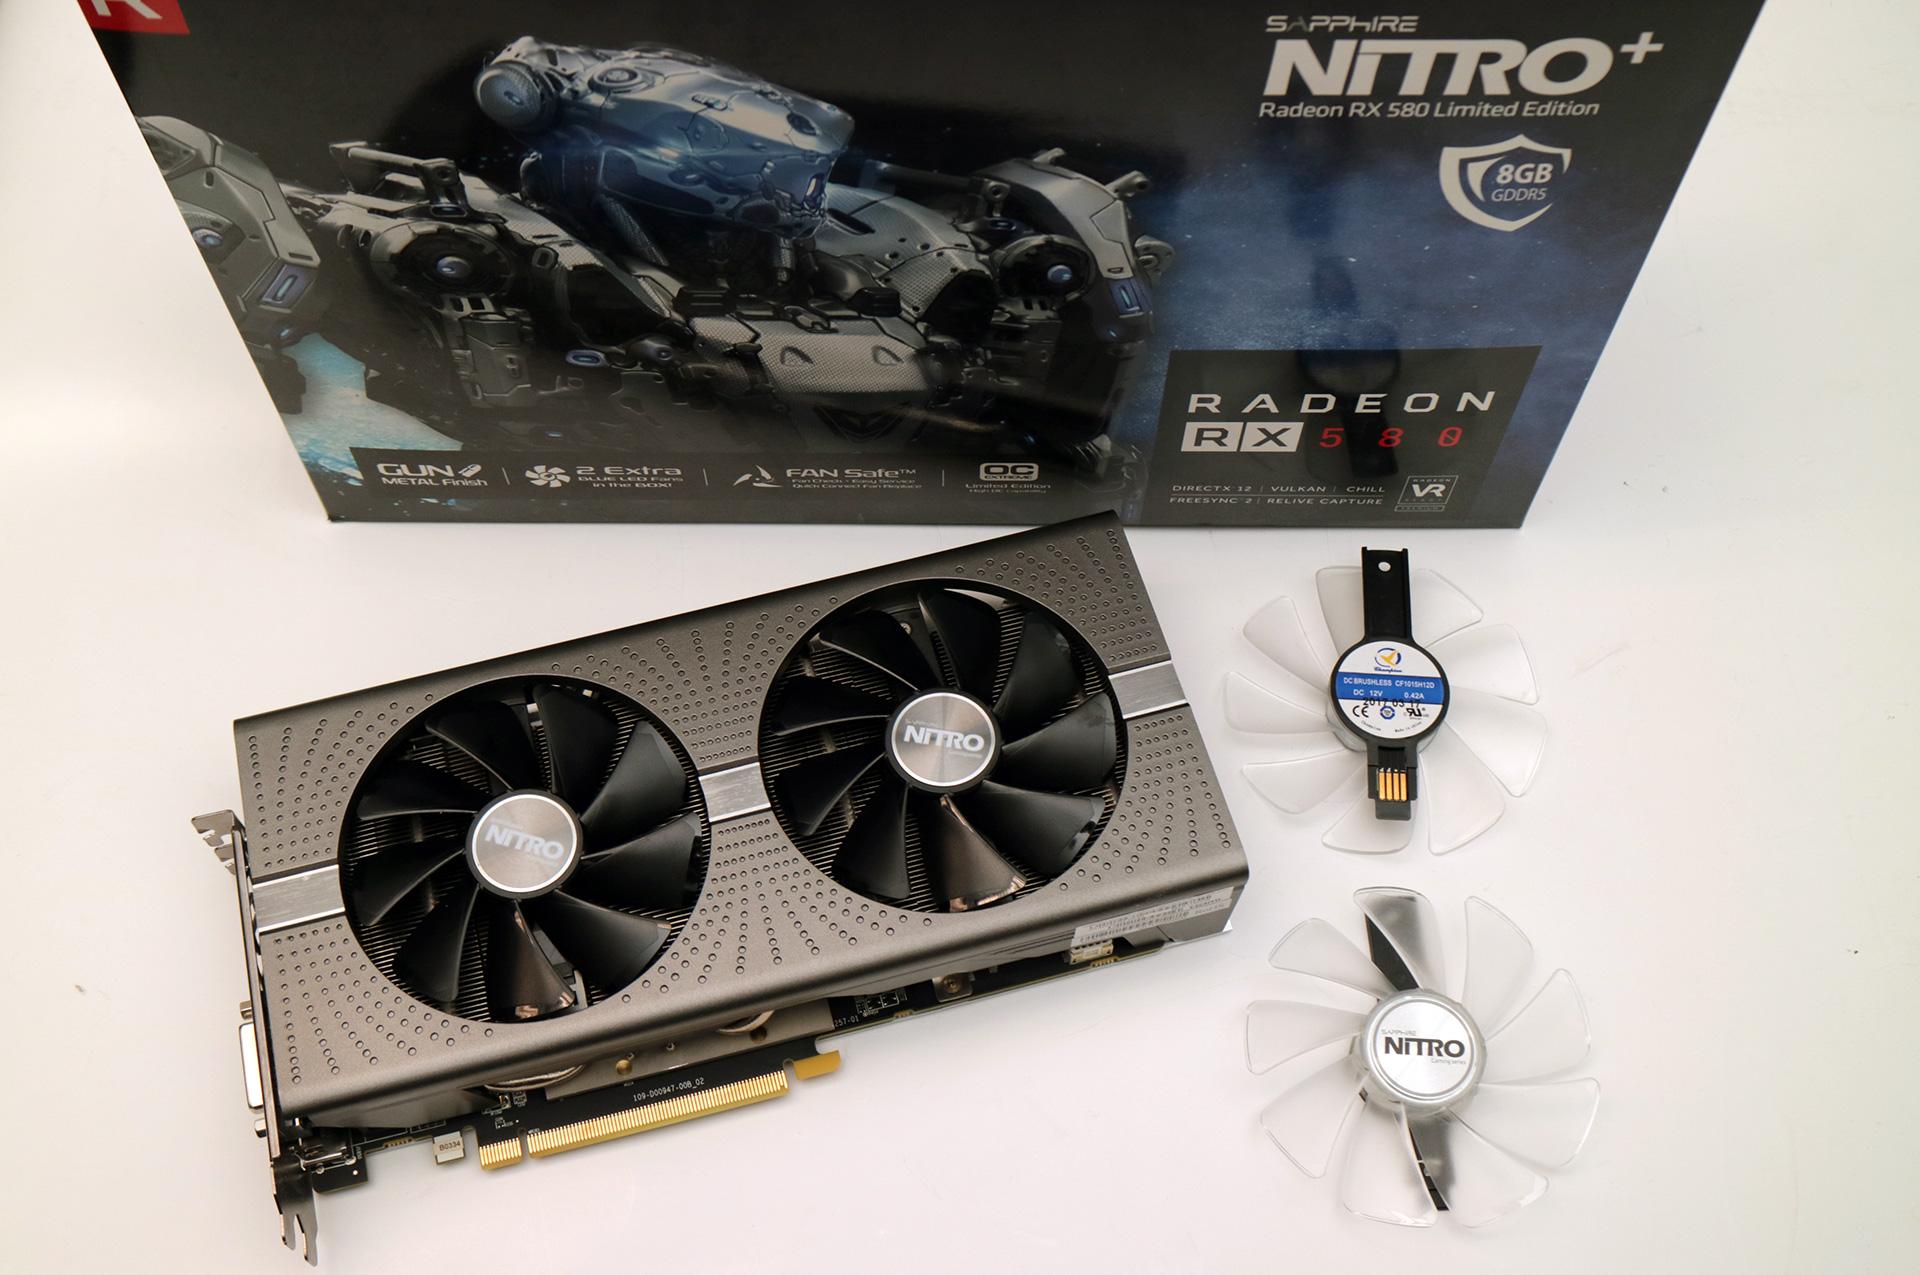 Crypto Mining With Sapphire NITRO+ Radeon RX 580 Limited Edition